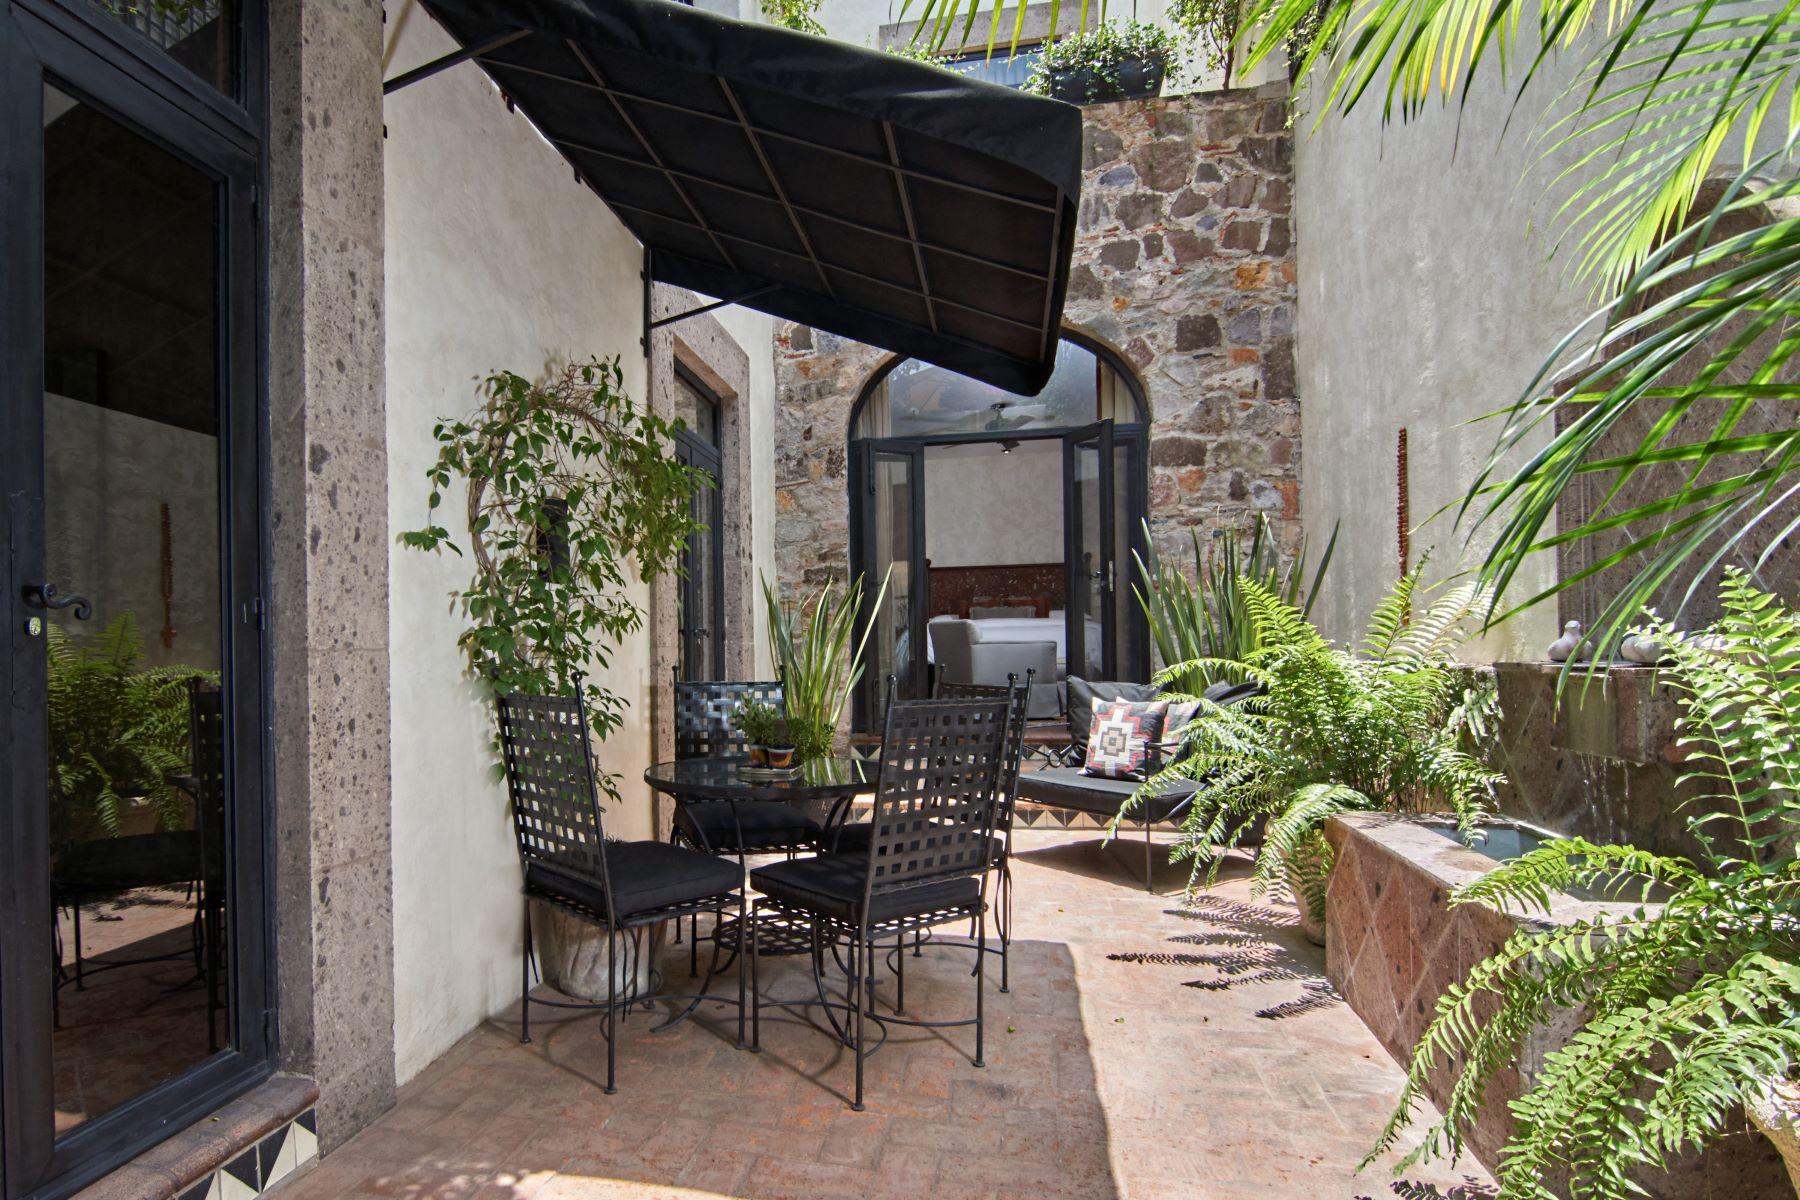 Additional photo for property listing at Casa Corazon Terraplen 36 San Miguel De Allende, Guanajuato 37700 México